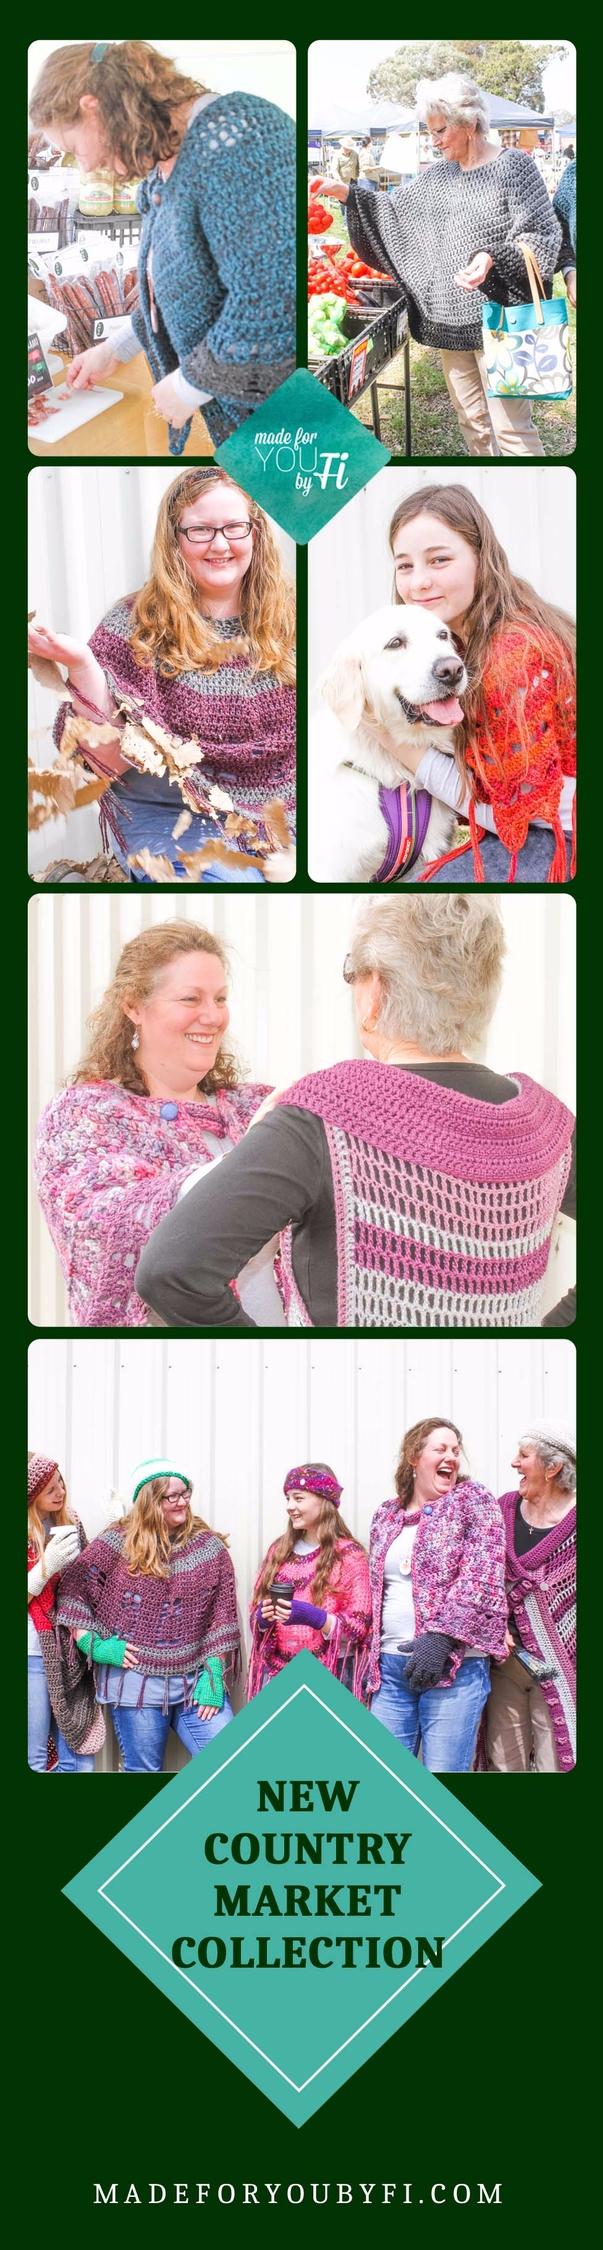 crocheter, simply lover gorgeou - madeforyoubyfi | ello